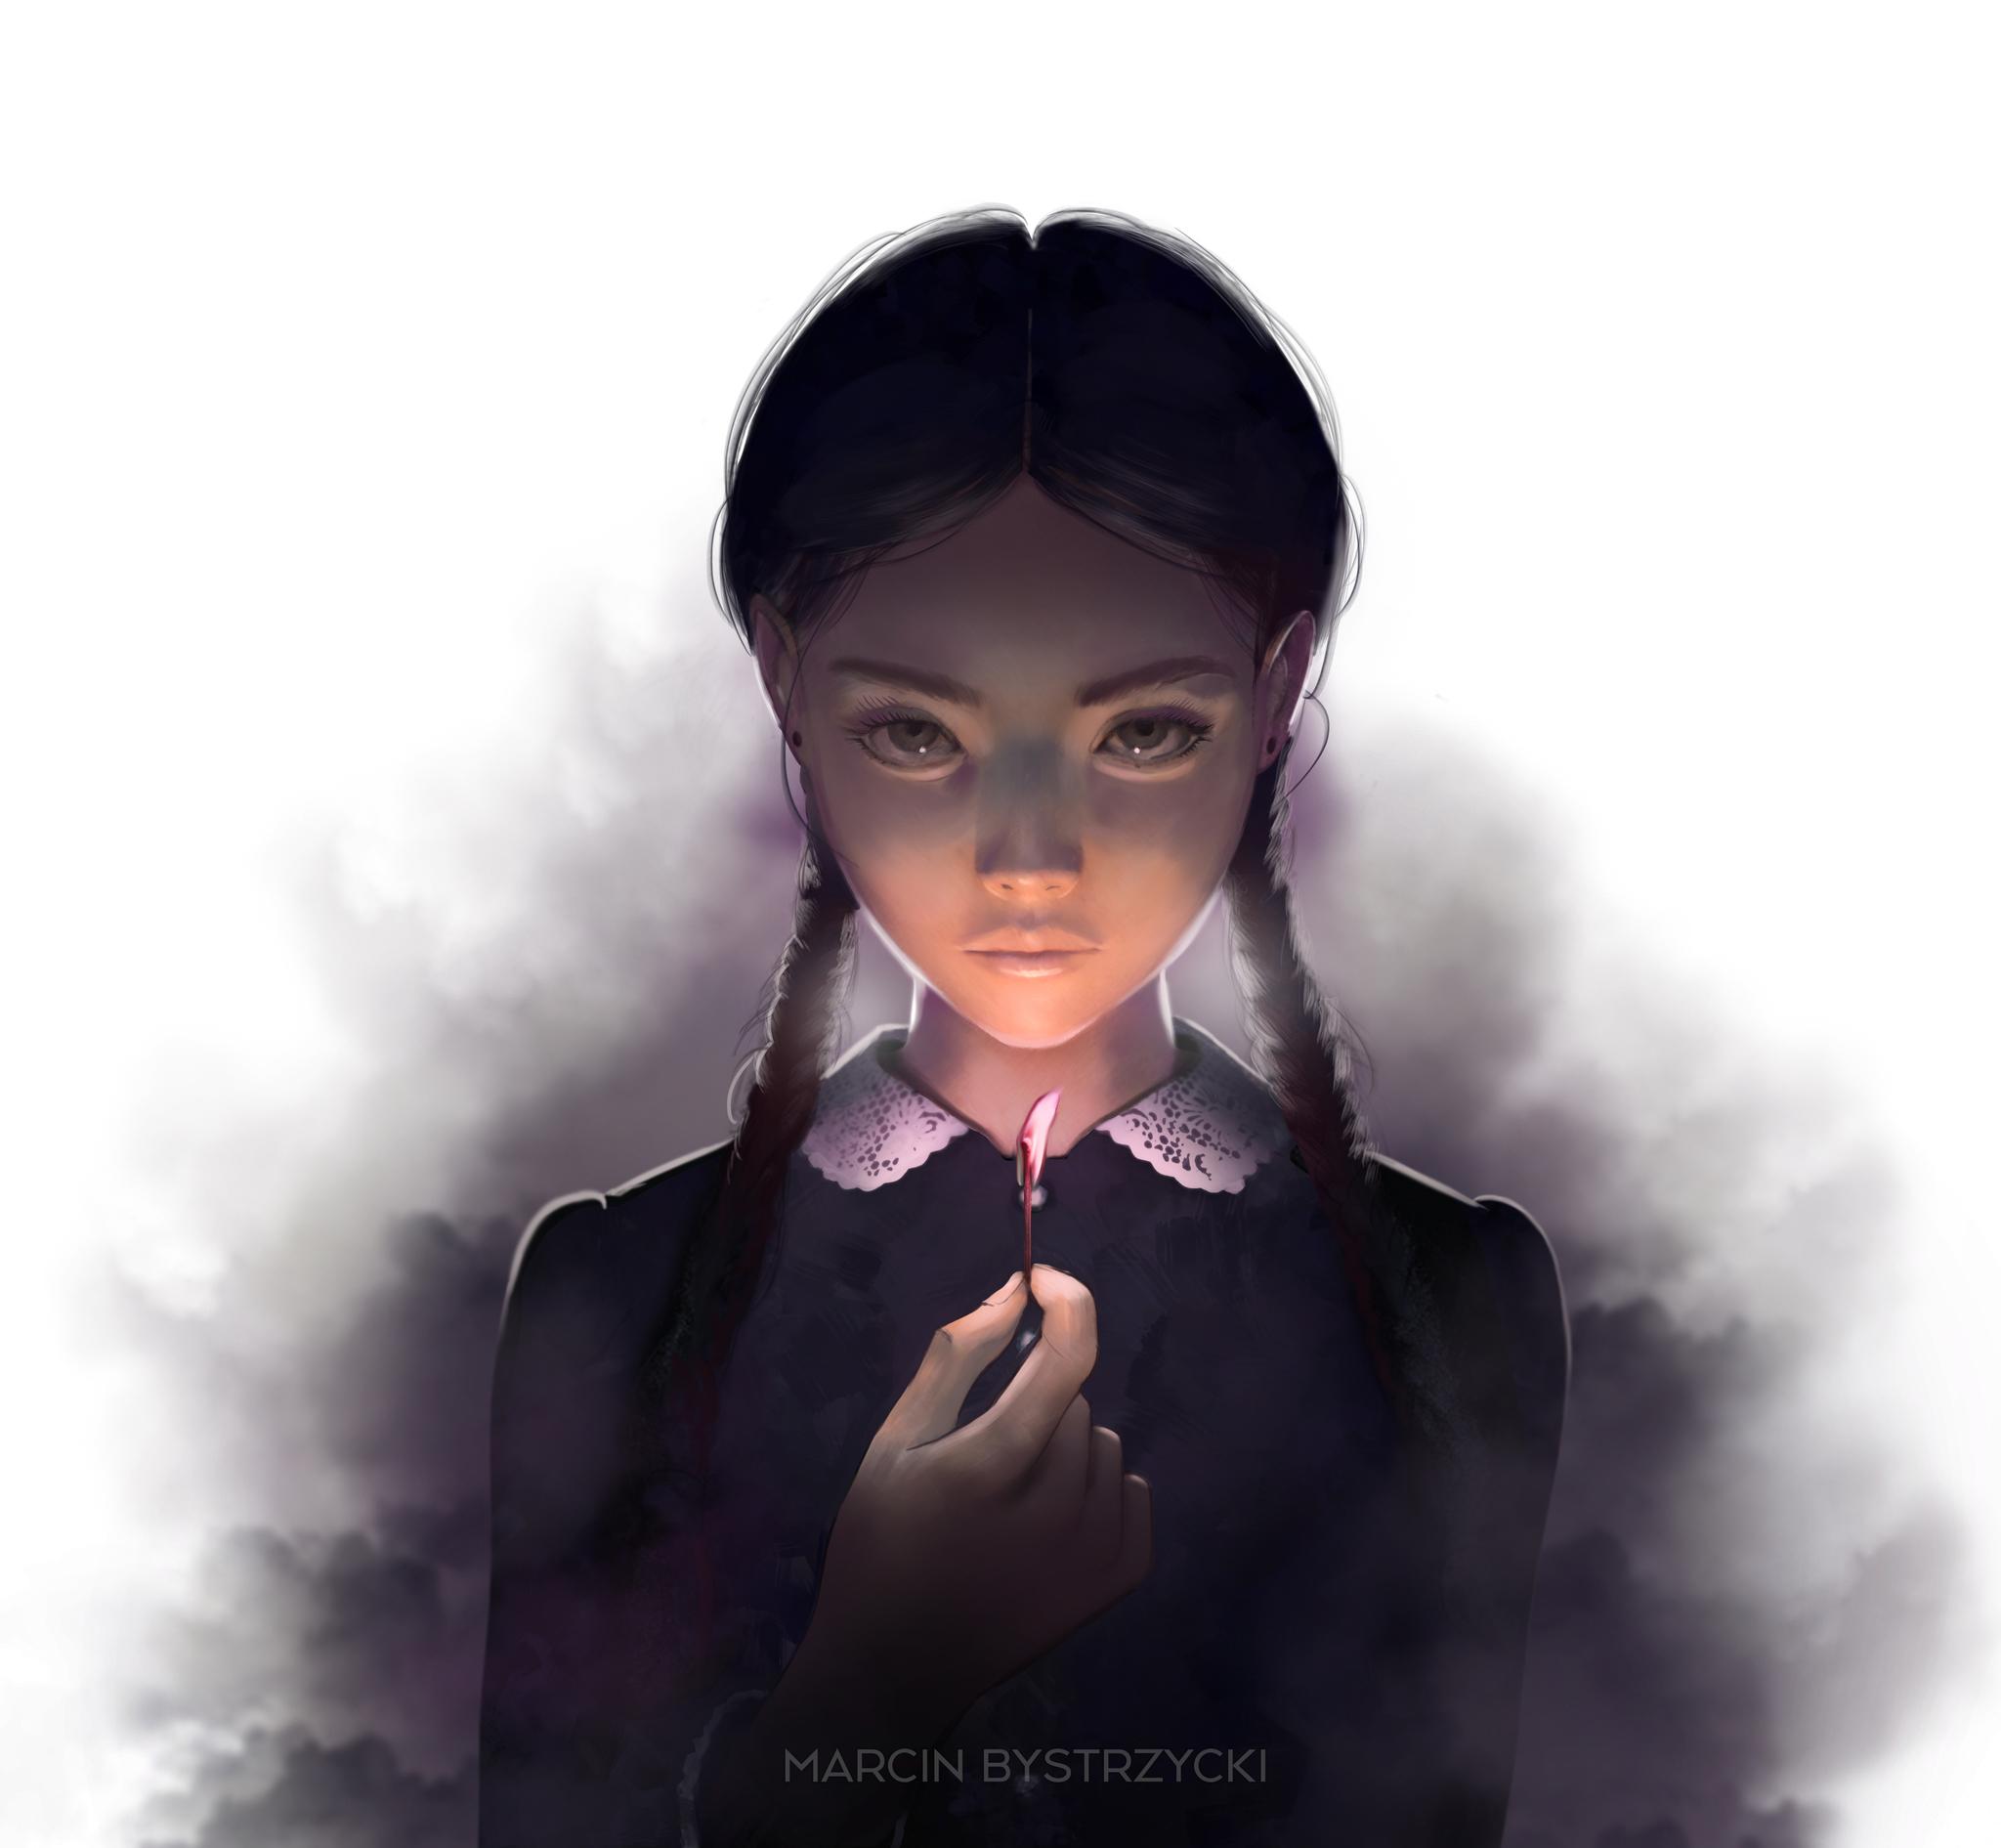 Wednesday Addams. Автор: Marcin Bystrzycki